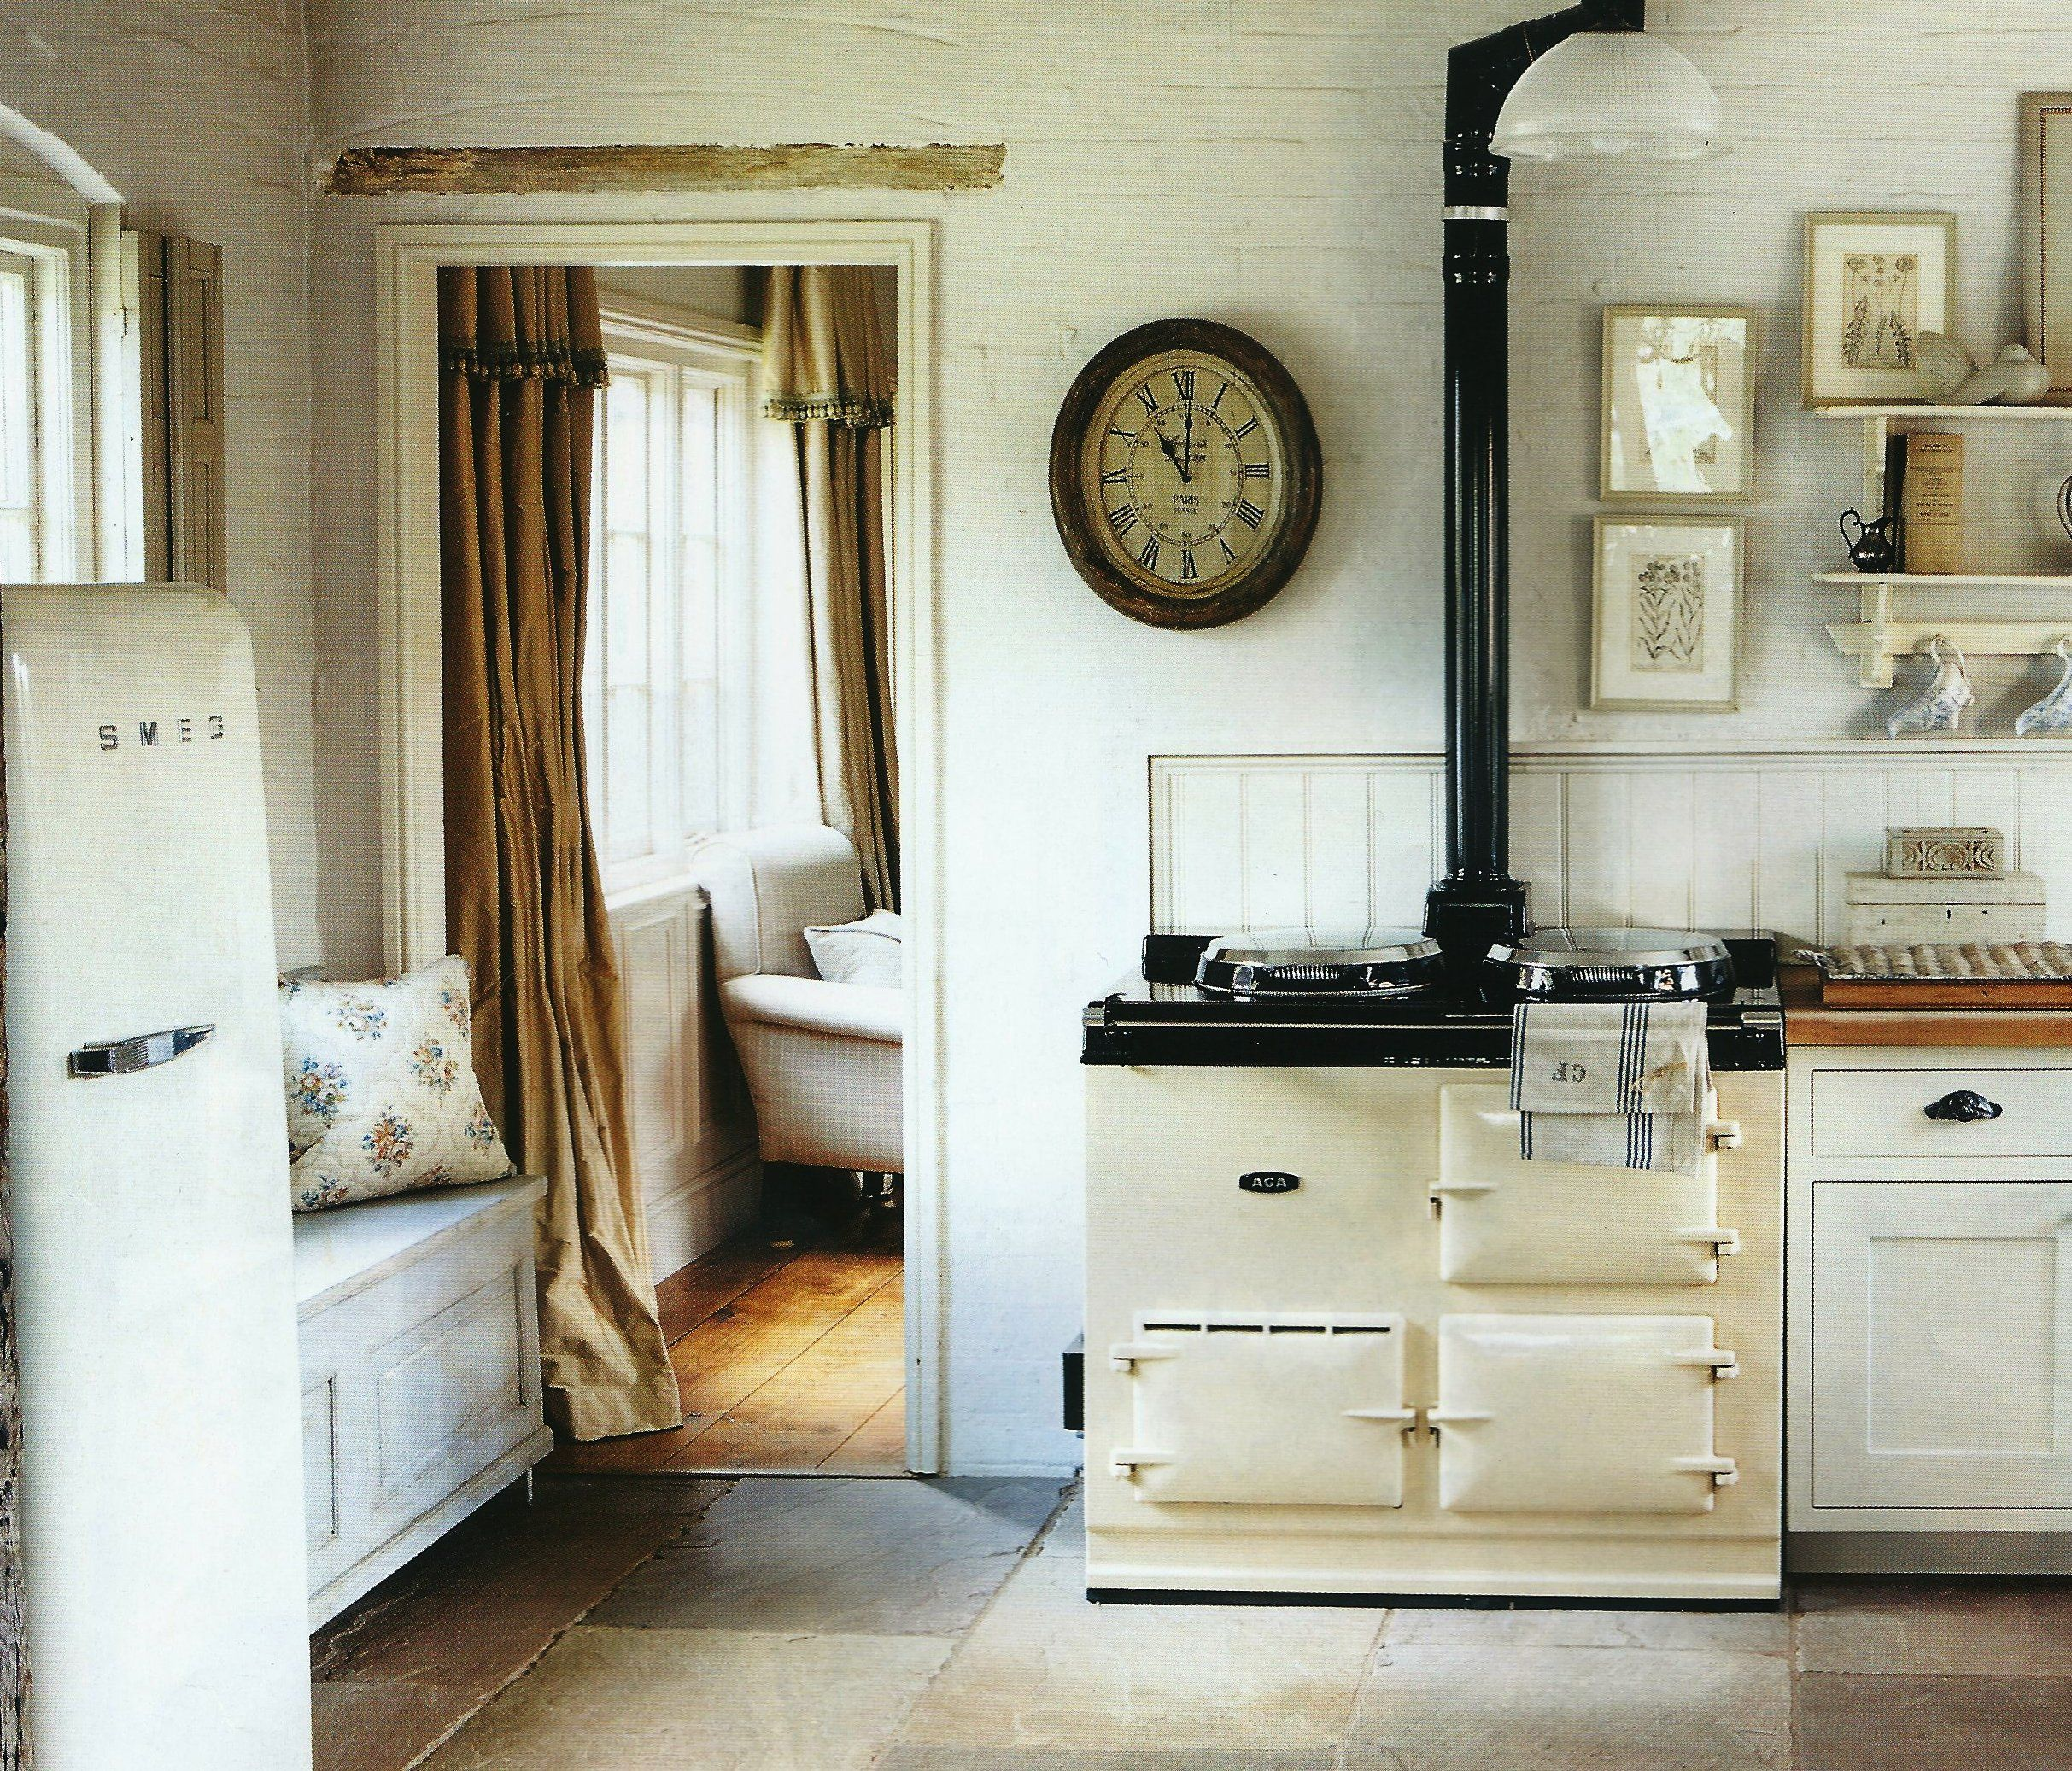 AGA stove, SMEG fridge, soothing cream-colored kitchen   H O M E ...